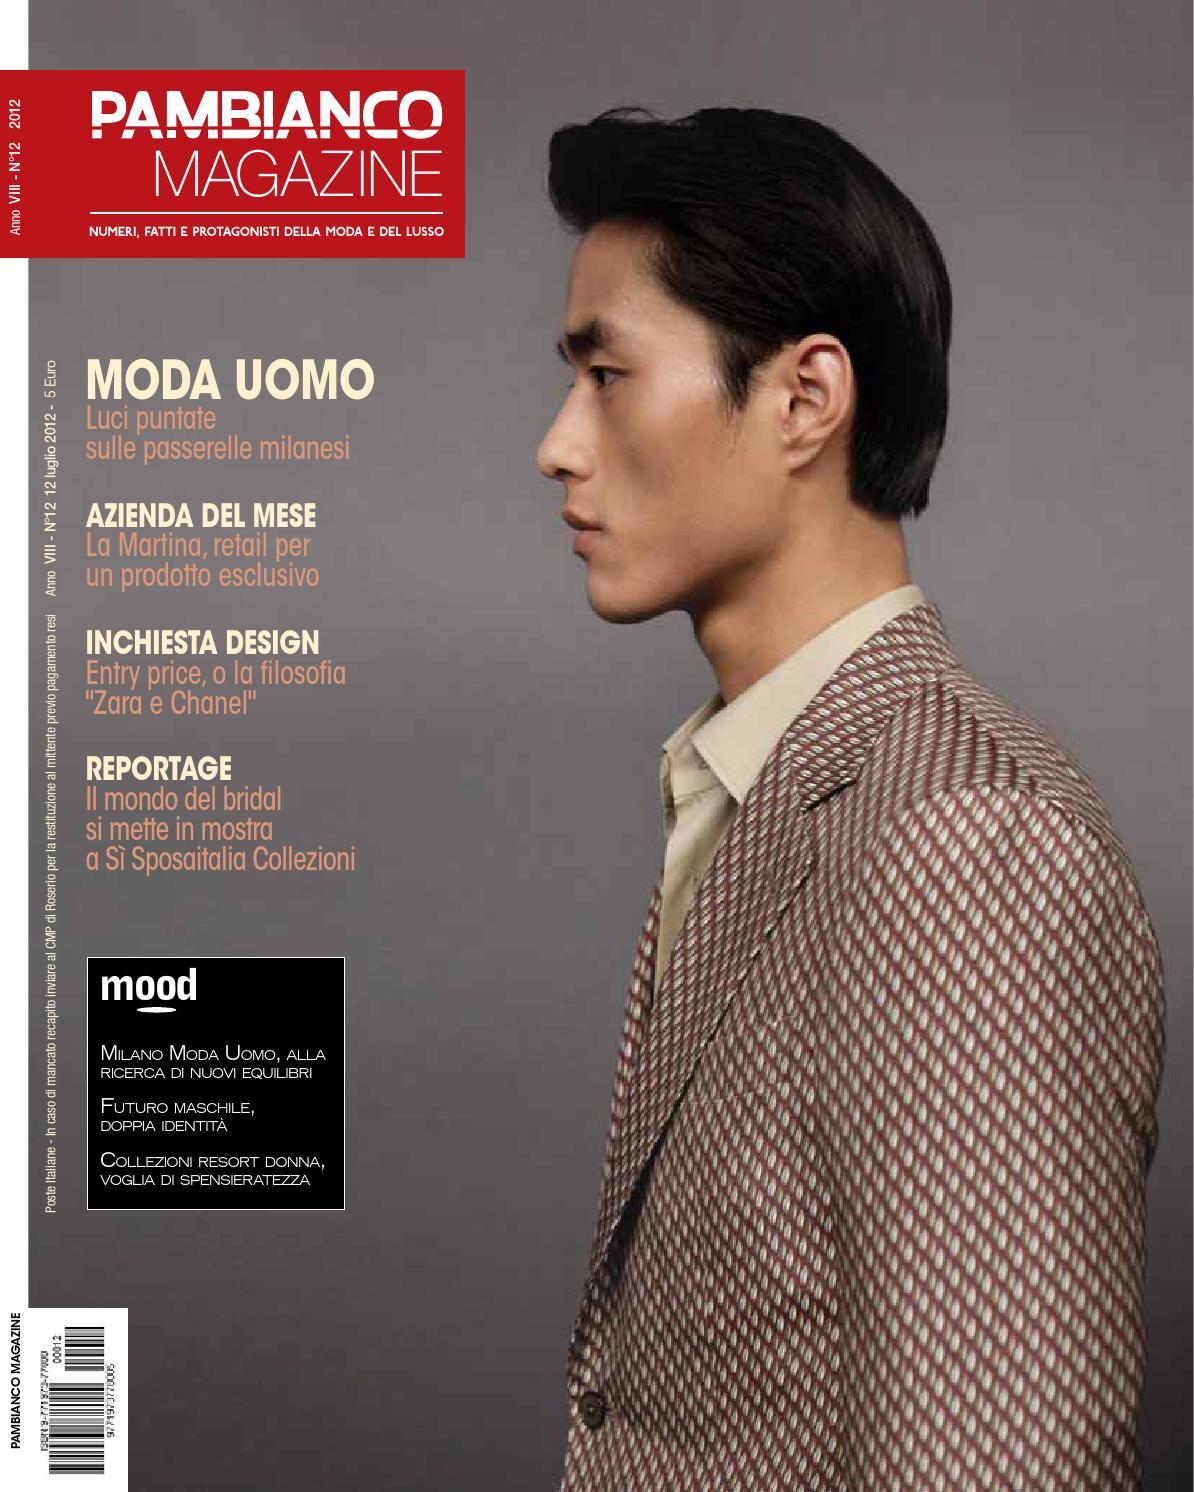 Pambianco magazine N.12 NIII by Pambianconews - issuu c1128befcc1